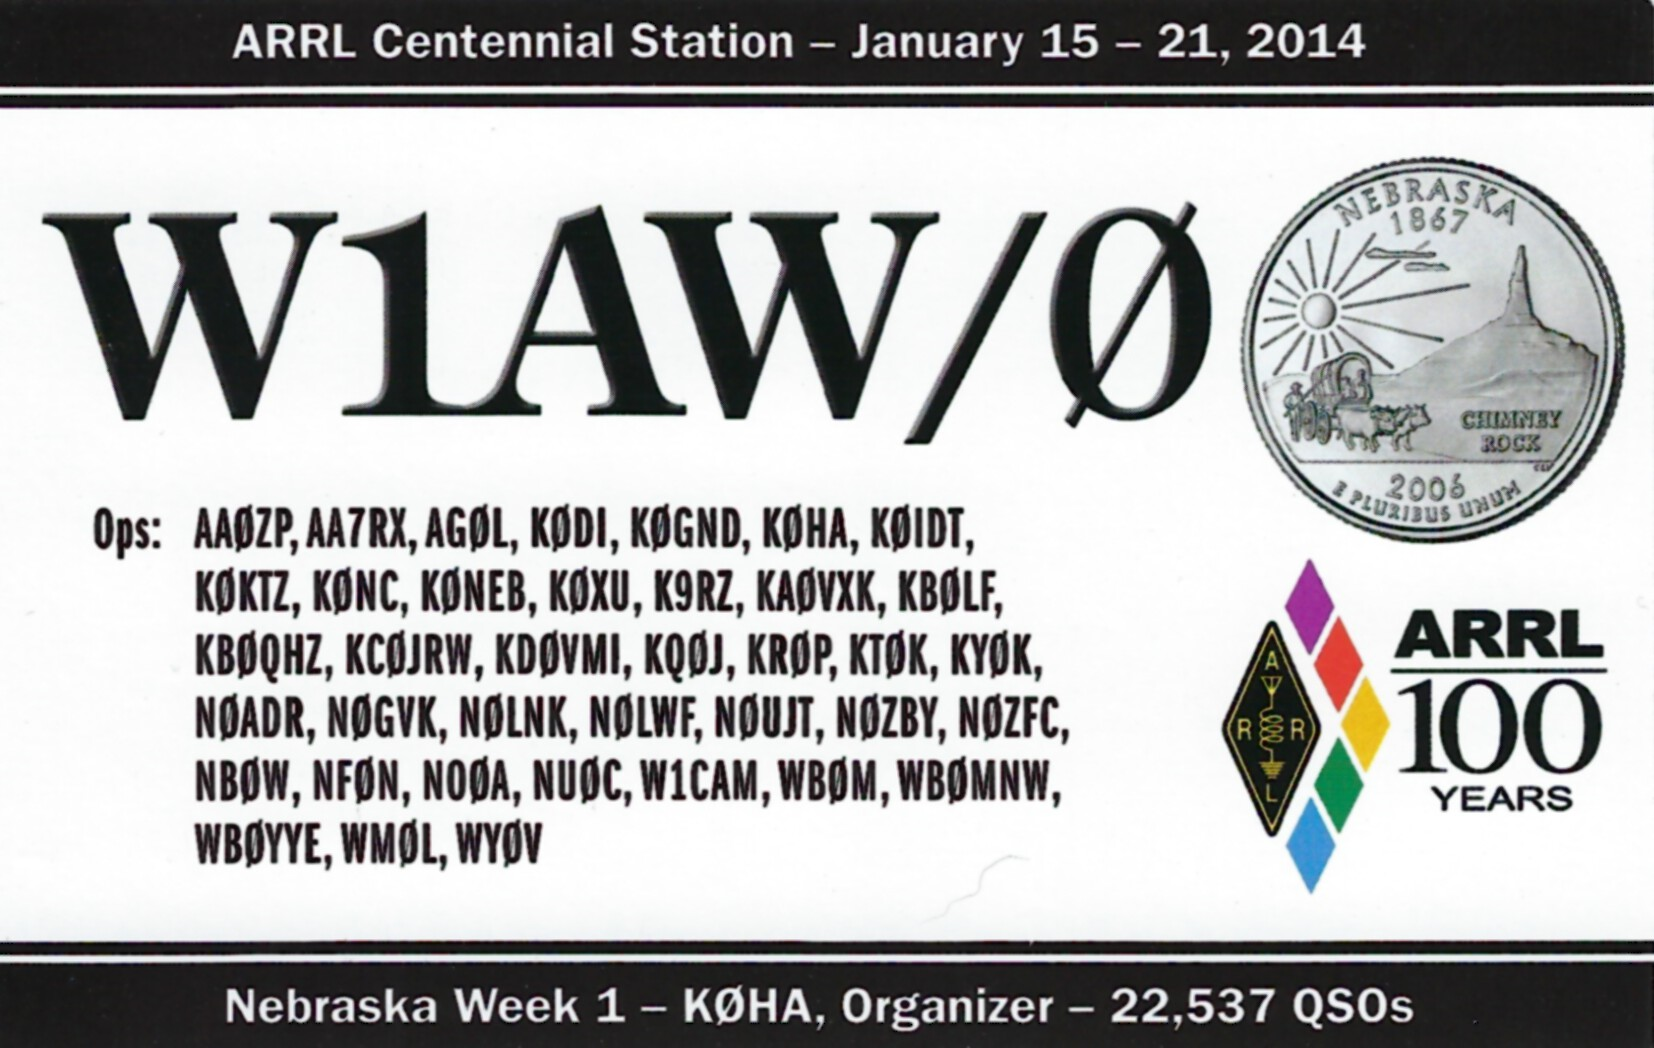 W1AW-0 NE